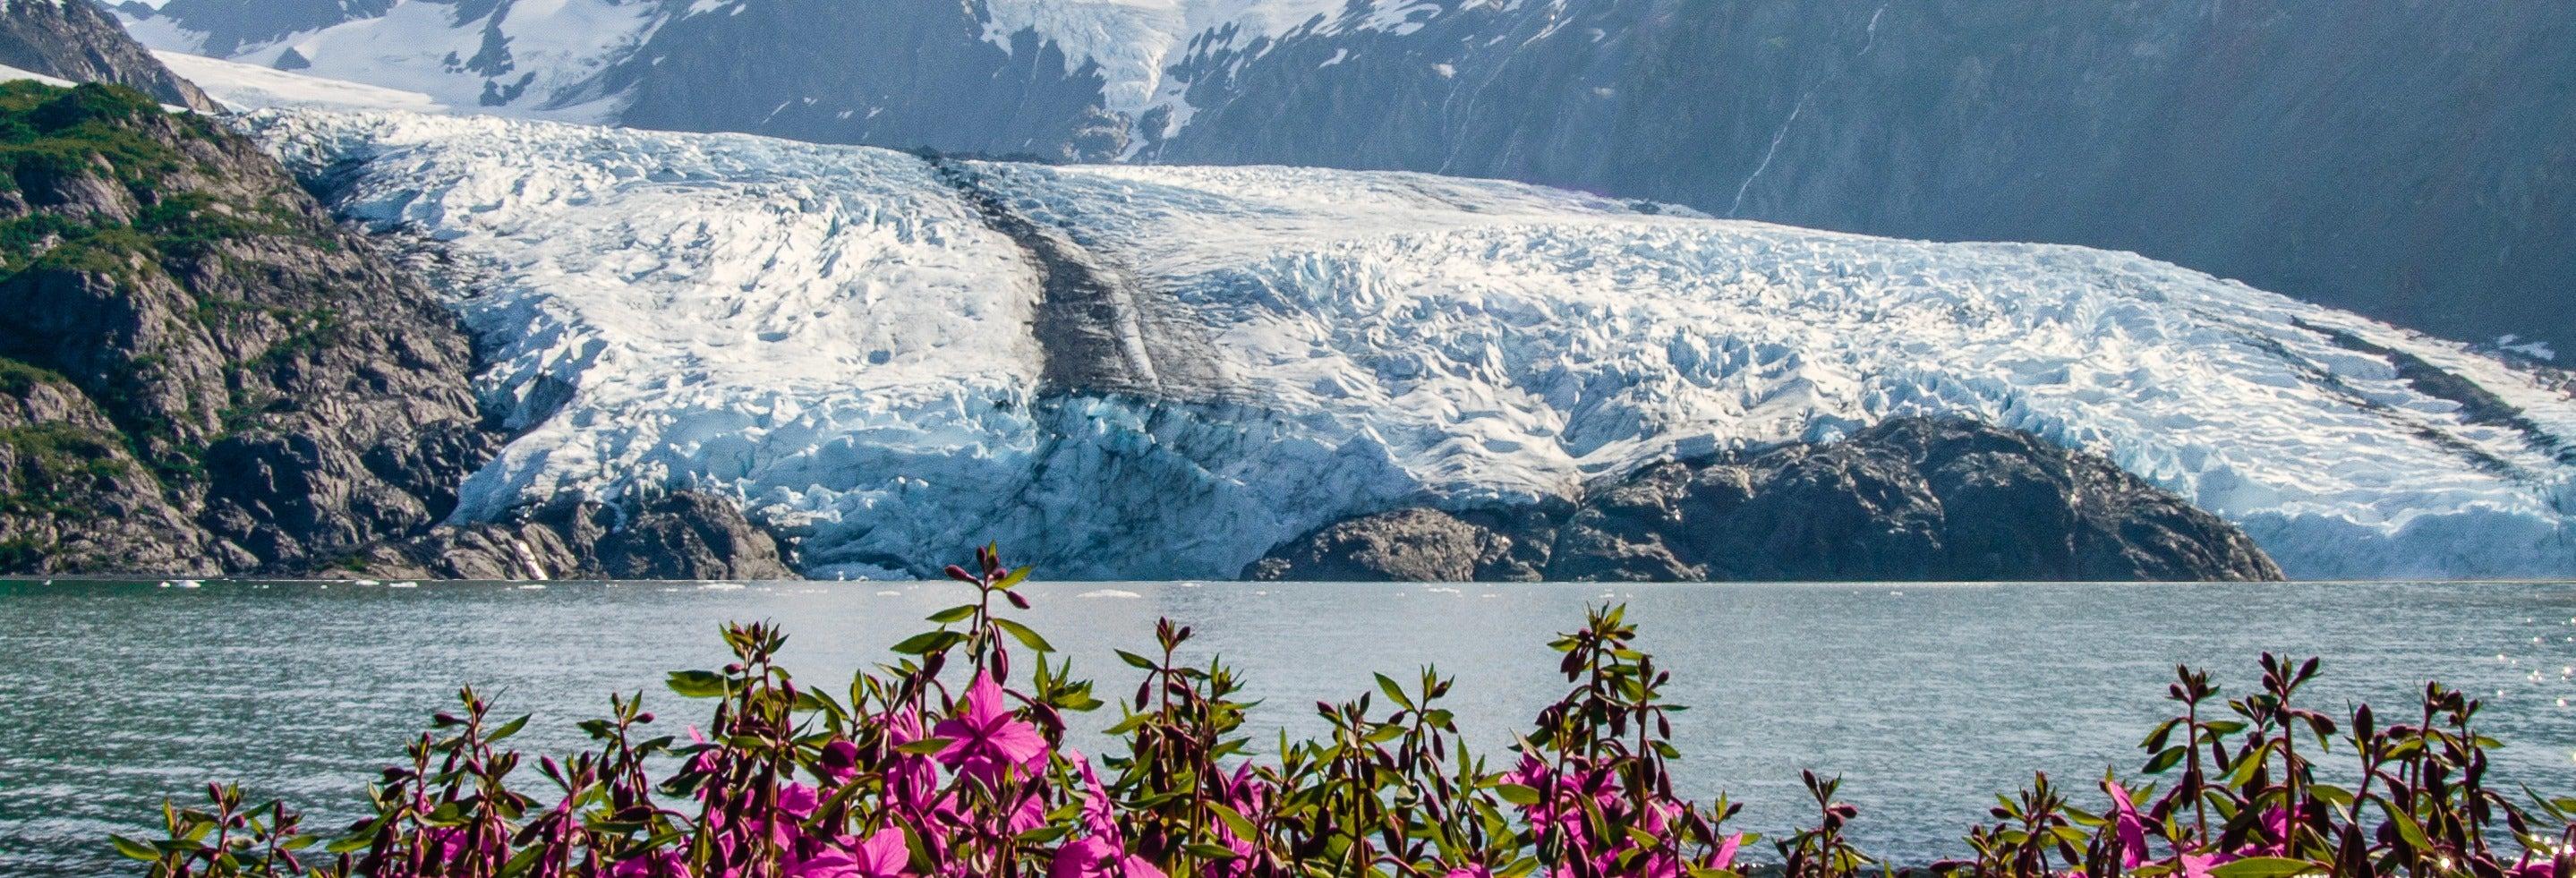 Glaciar Portage + Centro de Conservación de Vida Silvestre